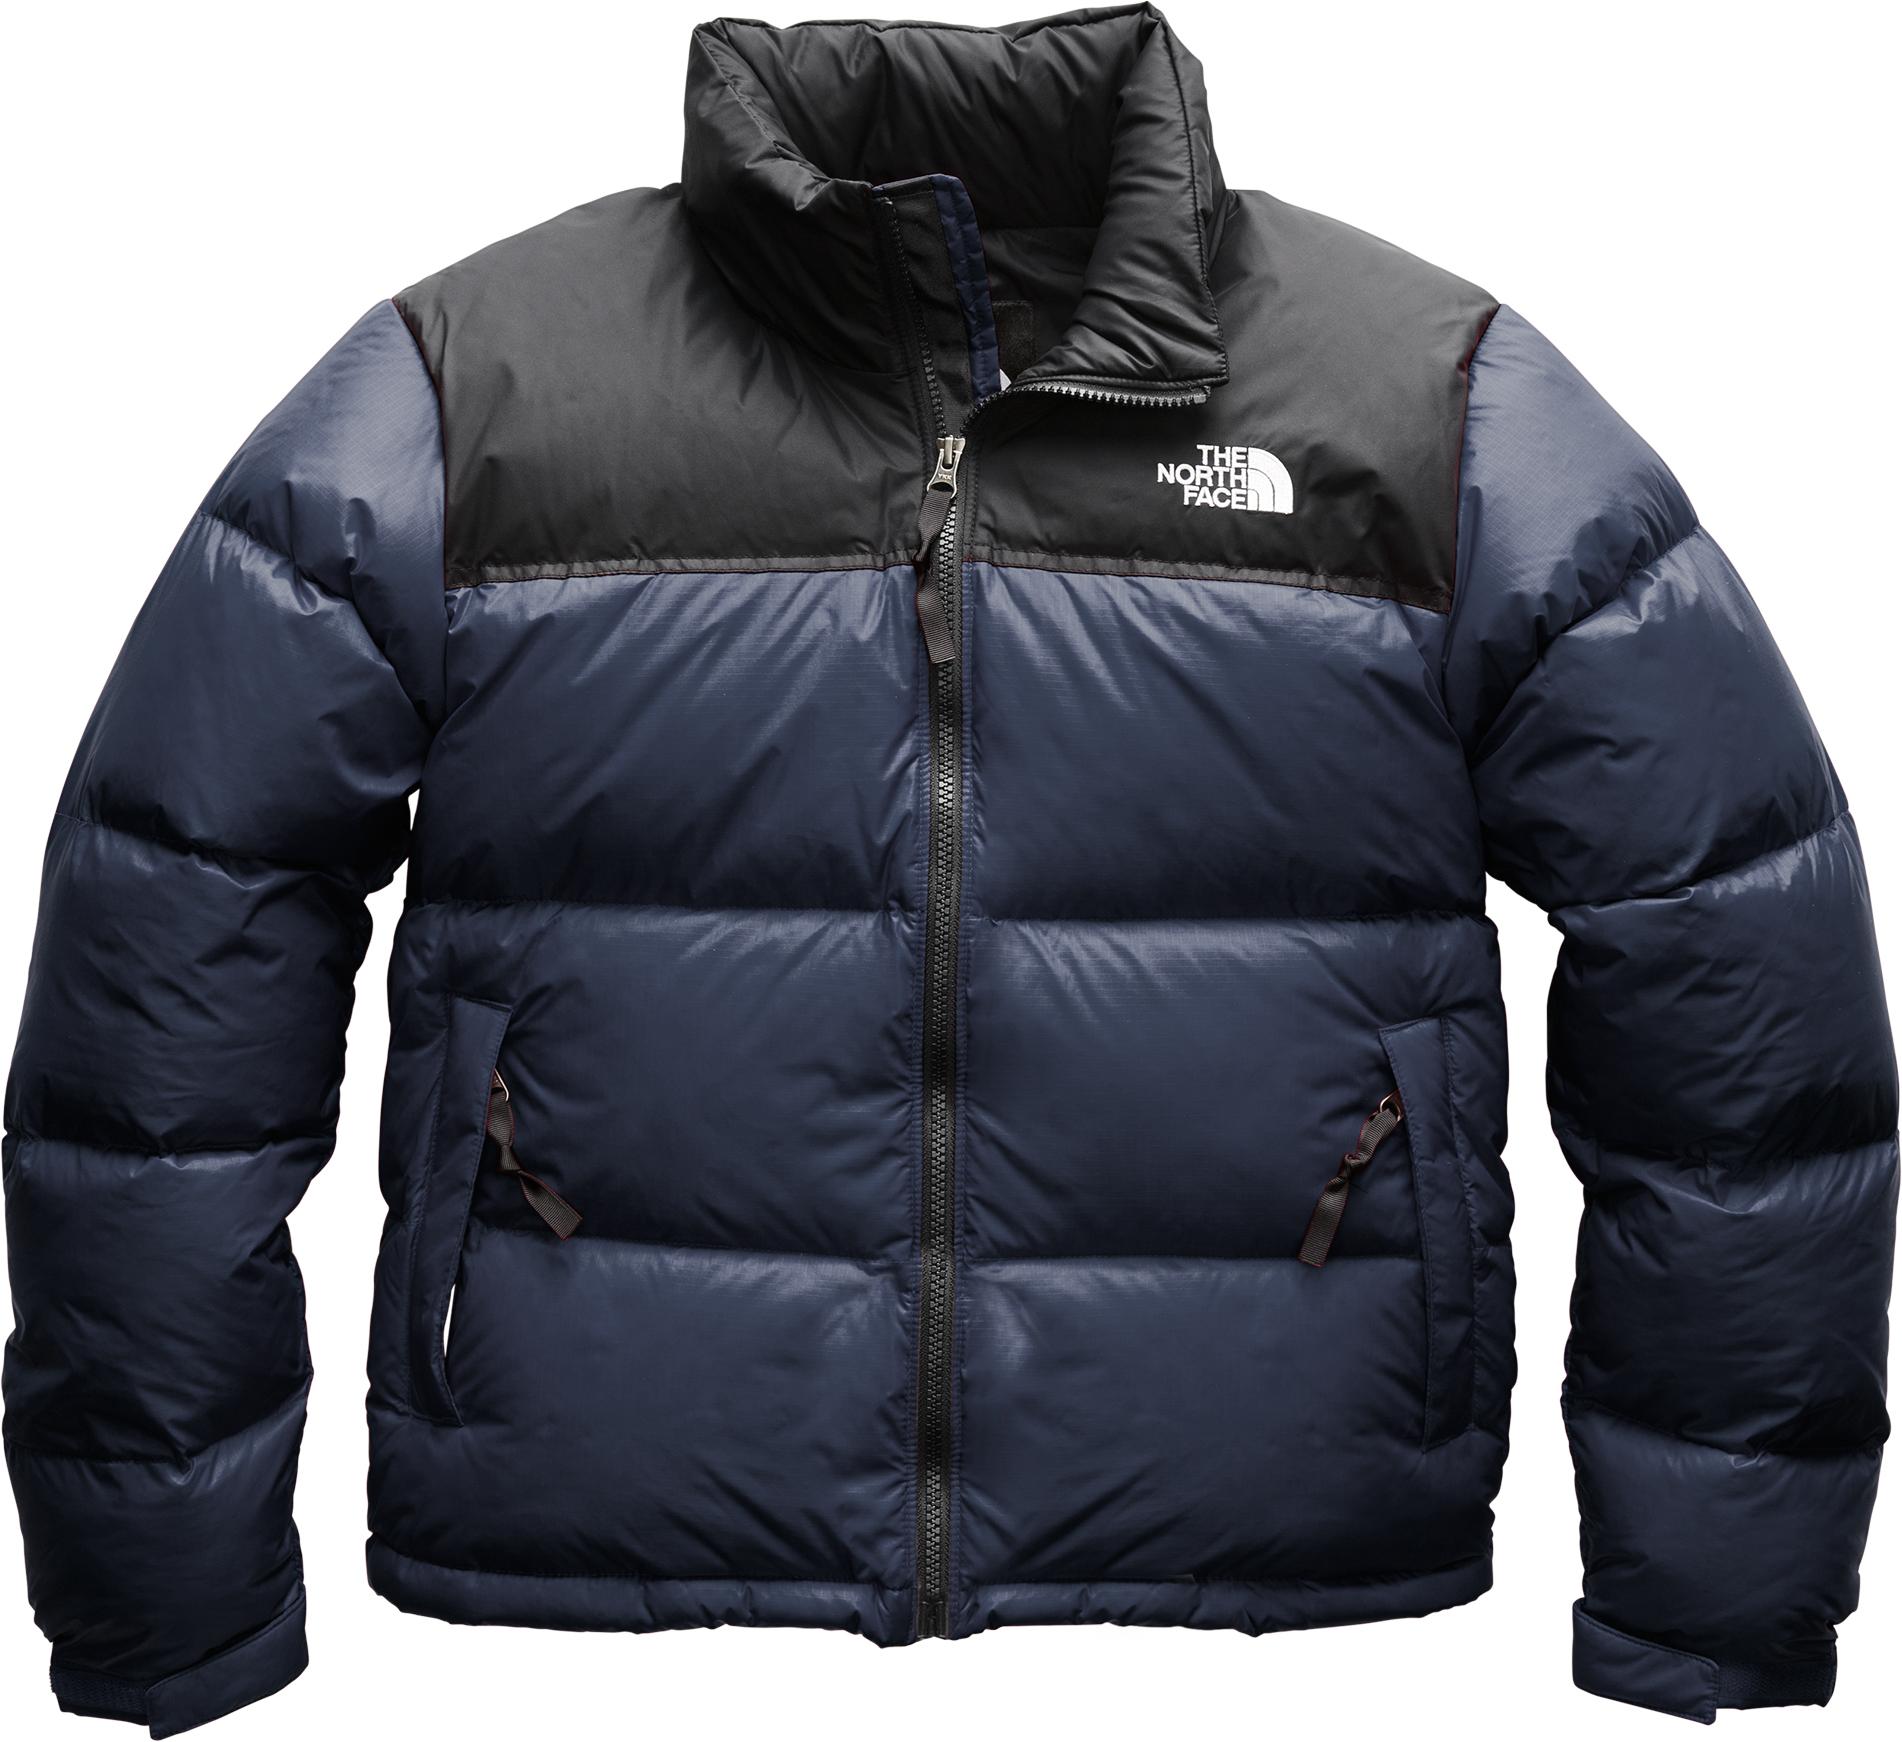 657d8576e648 The North Face 1996 Retro Nuptse Jacket - Women s